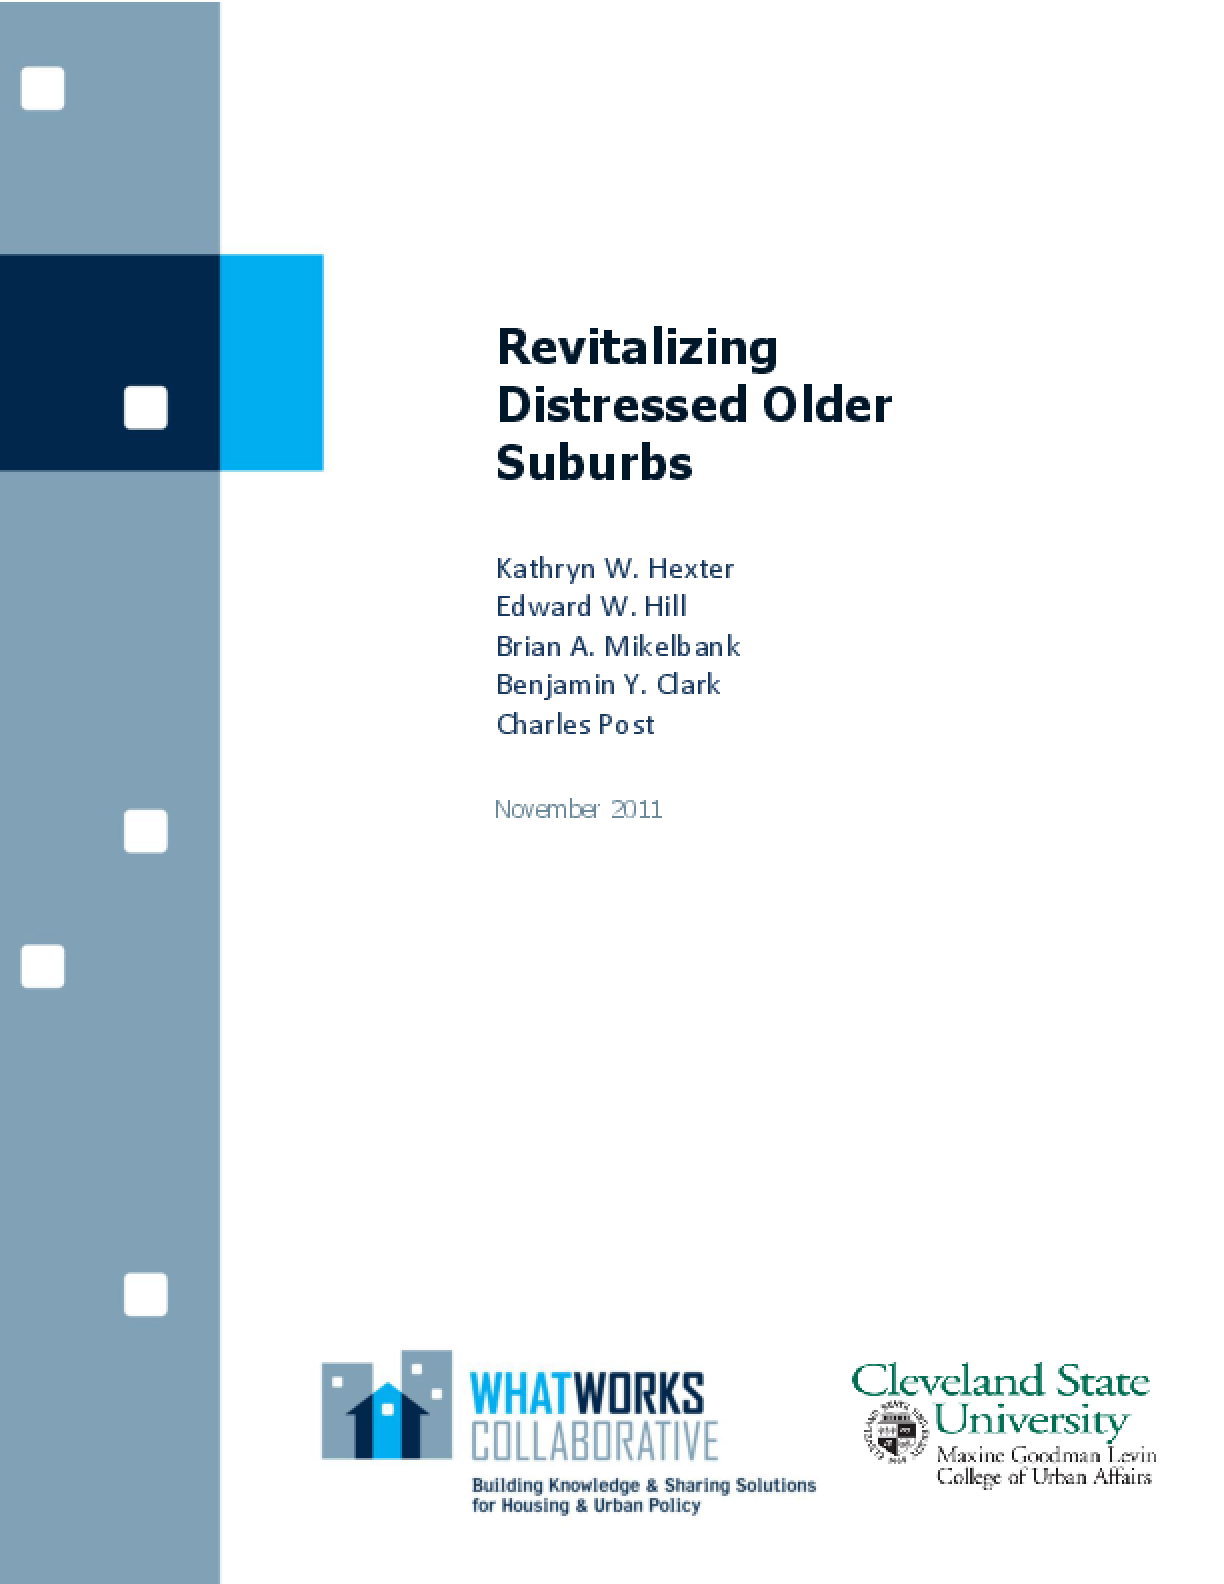 Revitalizing Distressed Older Suburbs